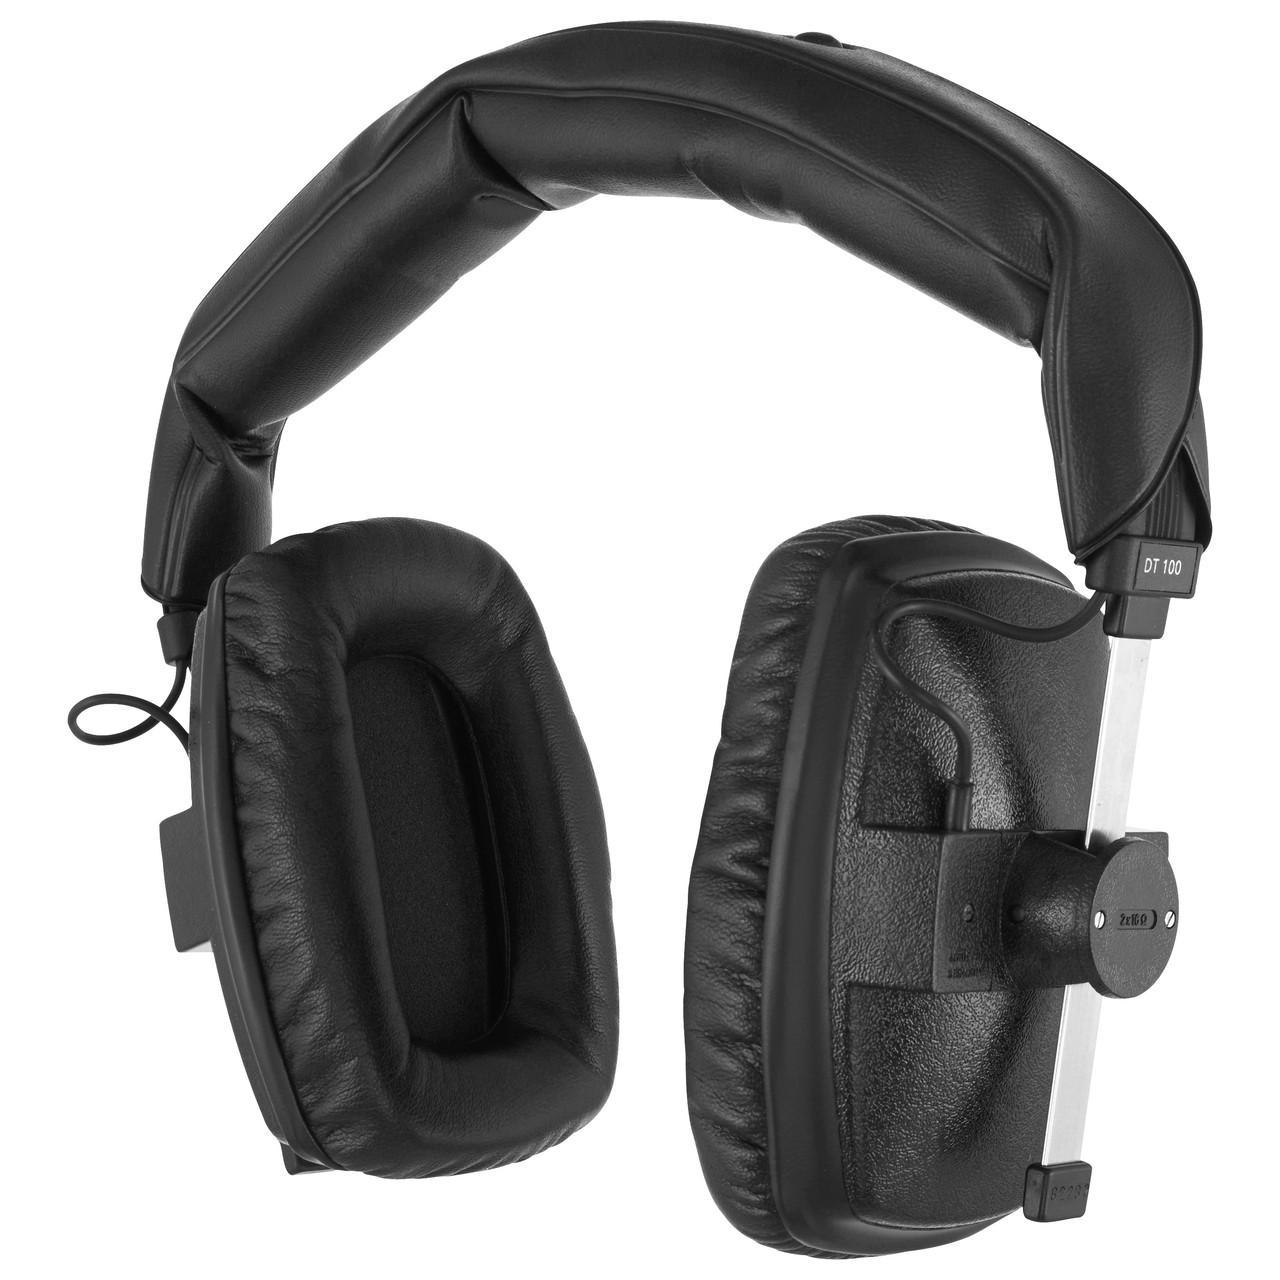 DT100 16 Ohms (Black)